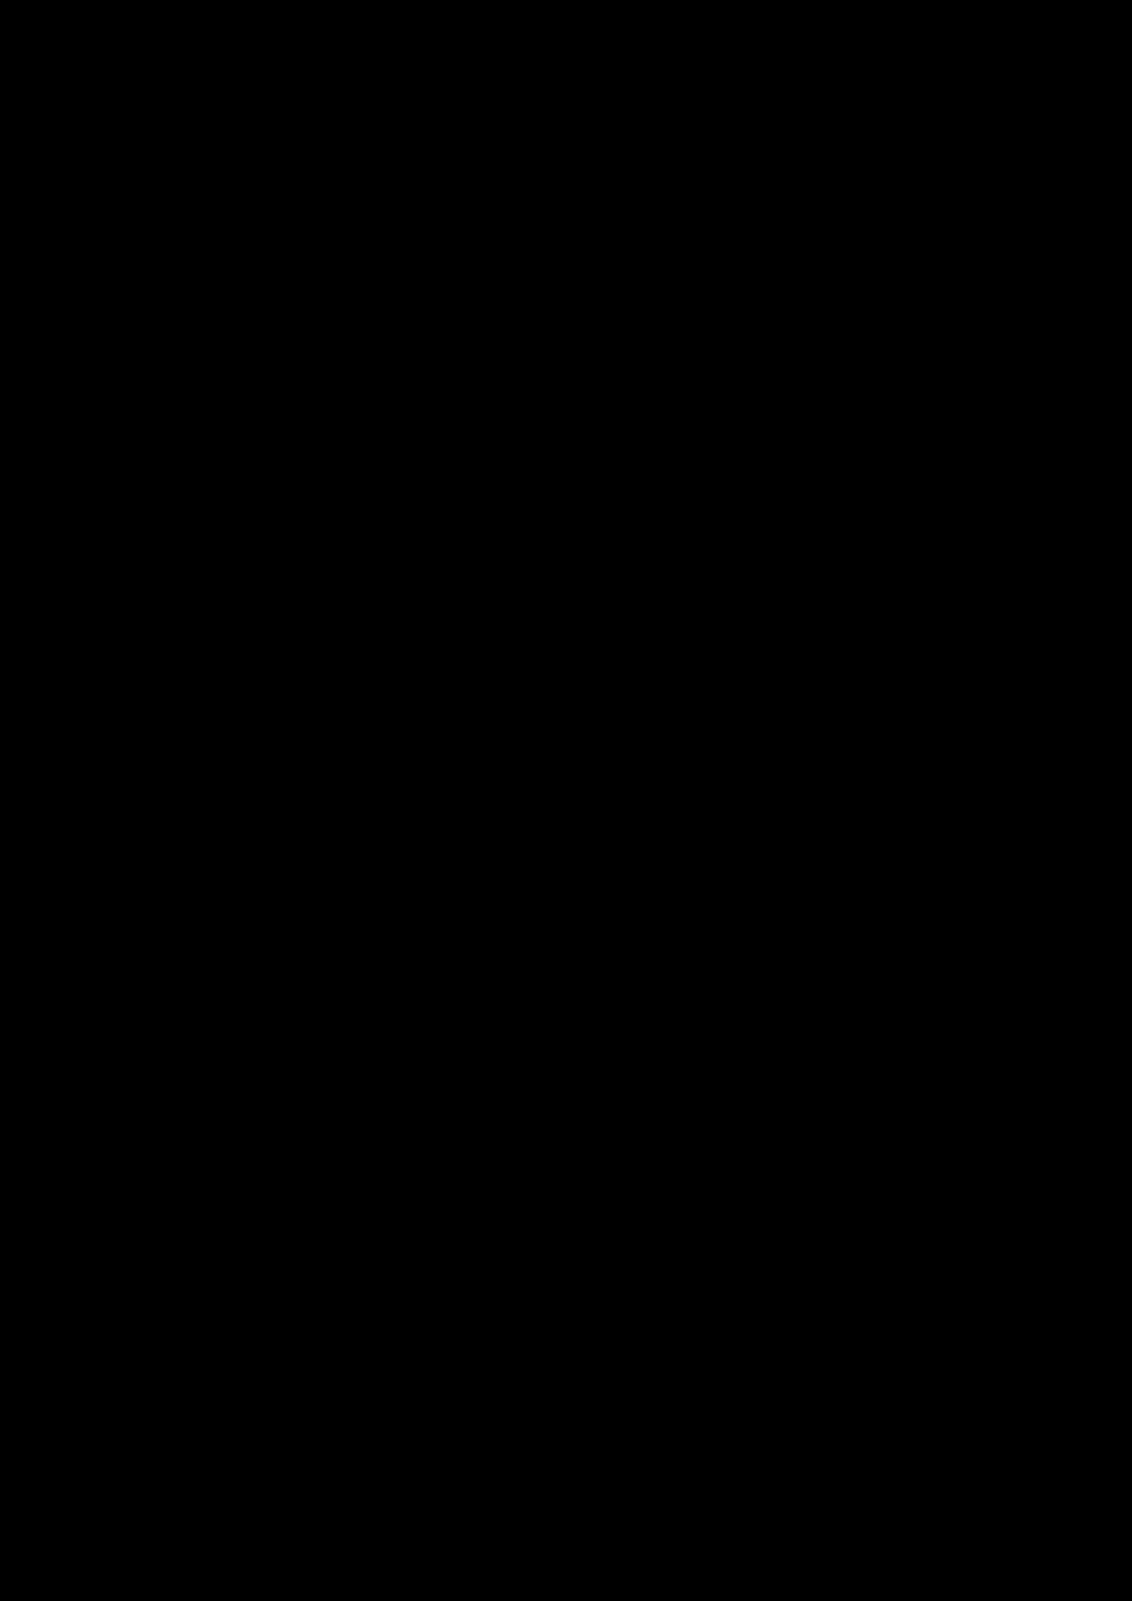 18 berez slide, Image 19